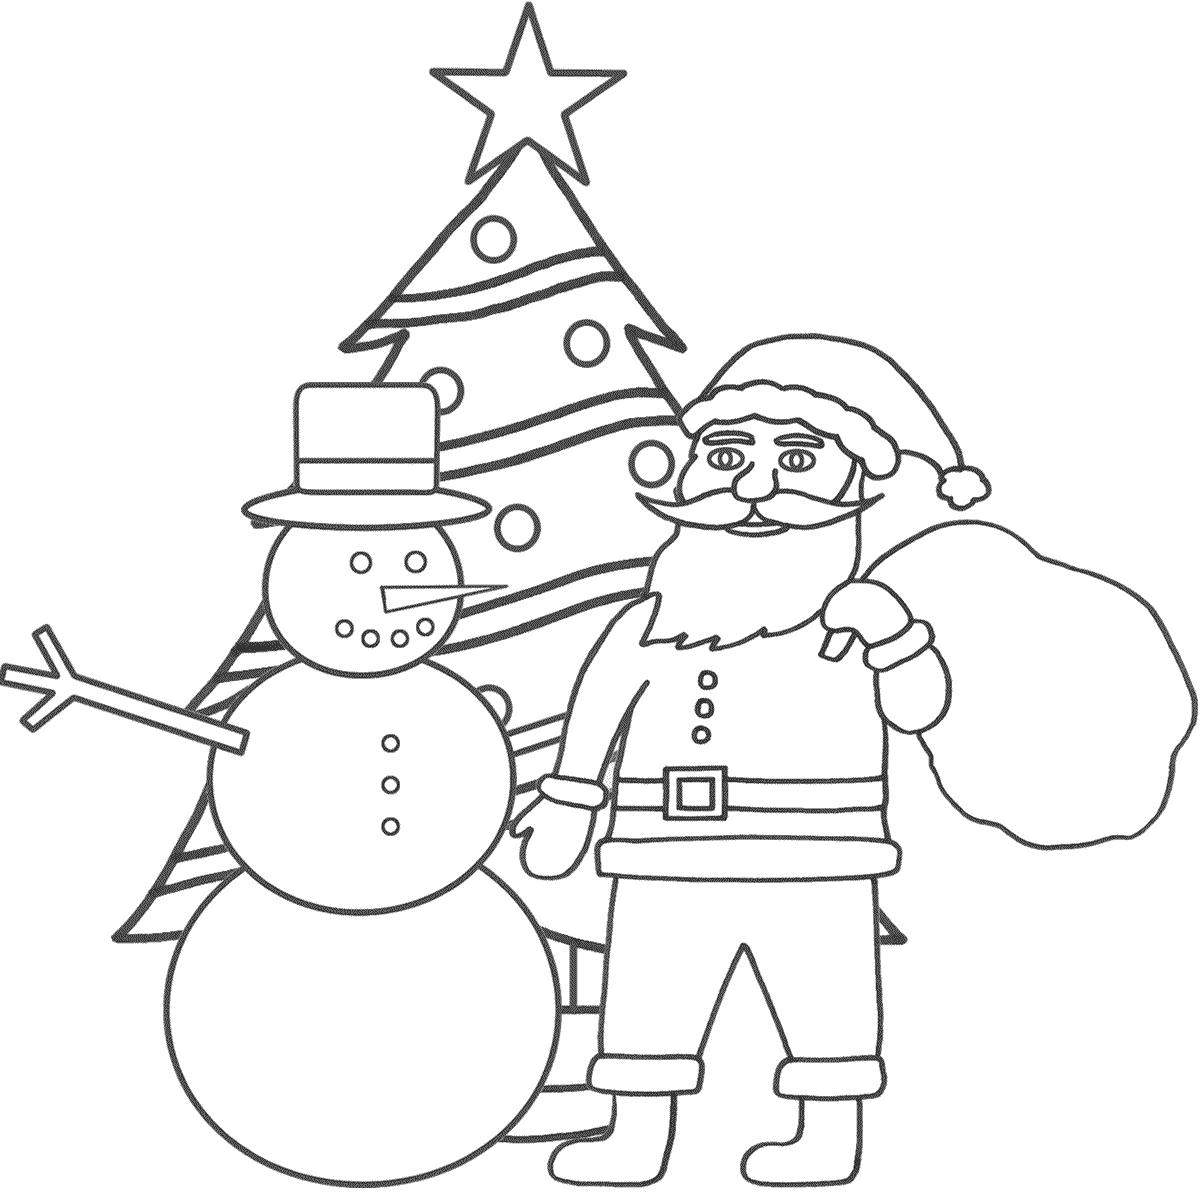 1200x1200 Santa Claus Drawing For Kids